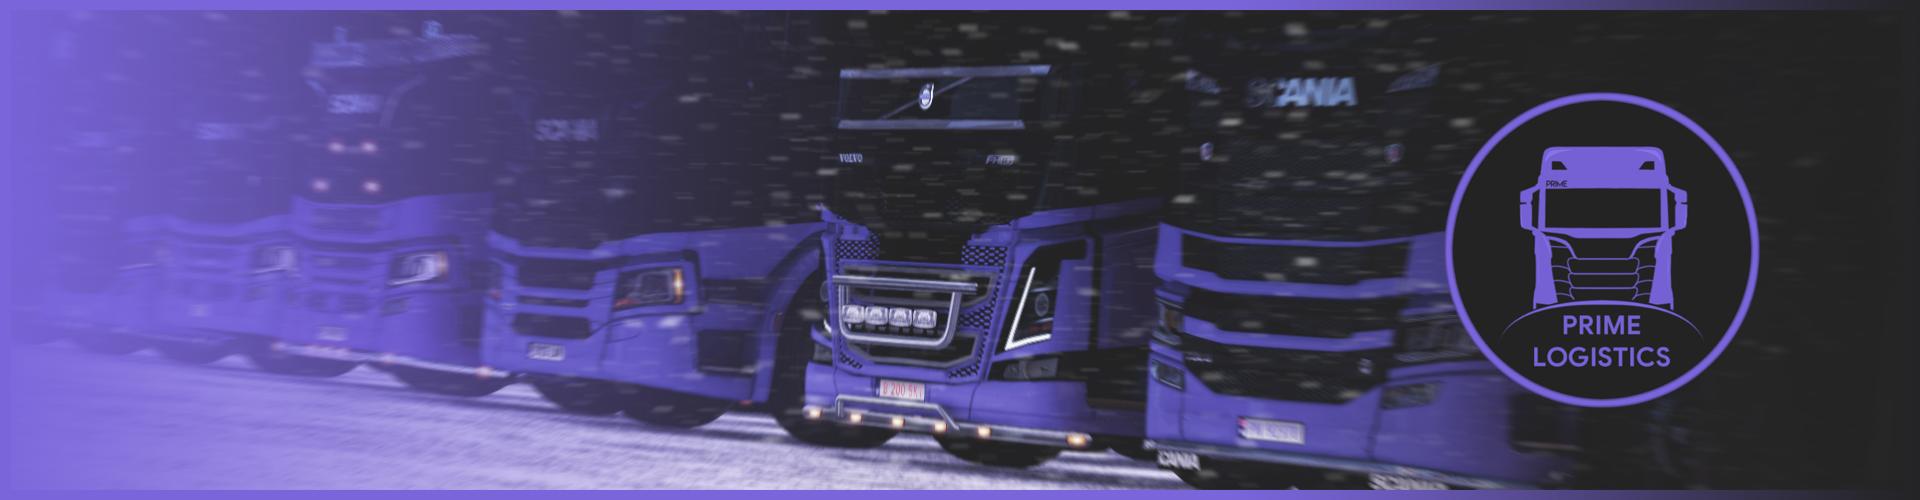 🟣 Prime Logistics Convoy #70